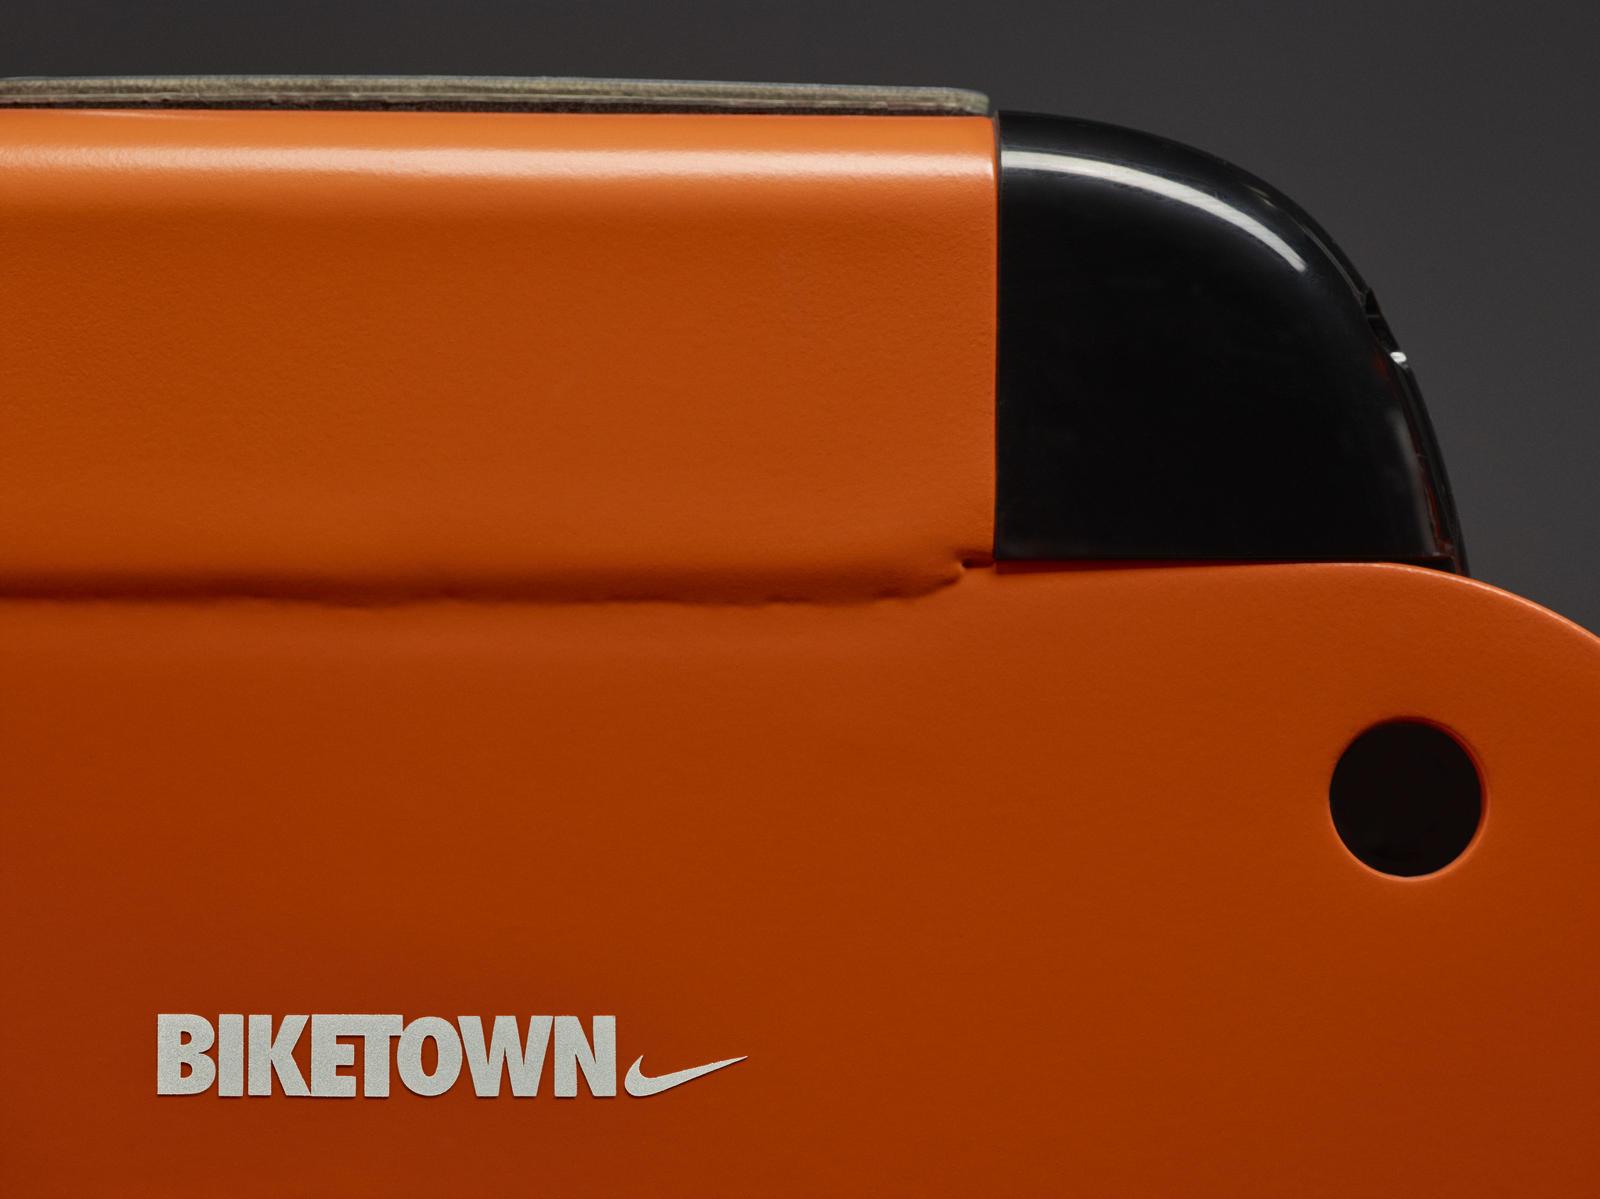 Nike_BIKETOWN_det_005_native_1600